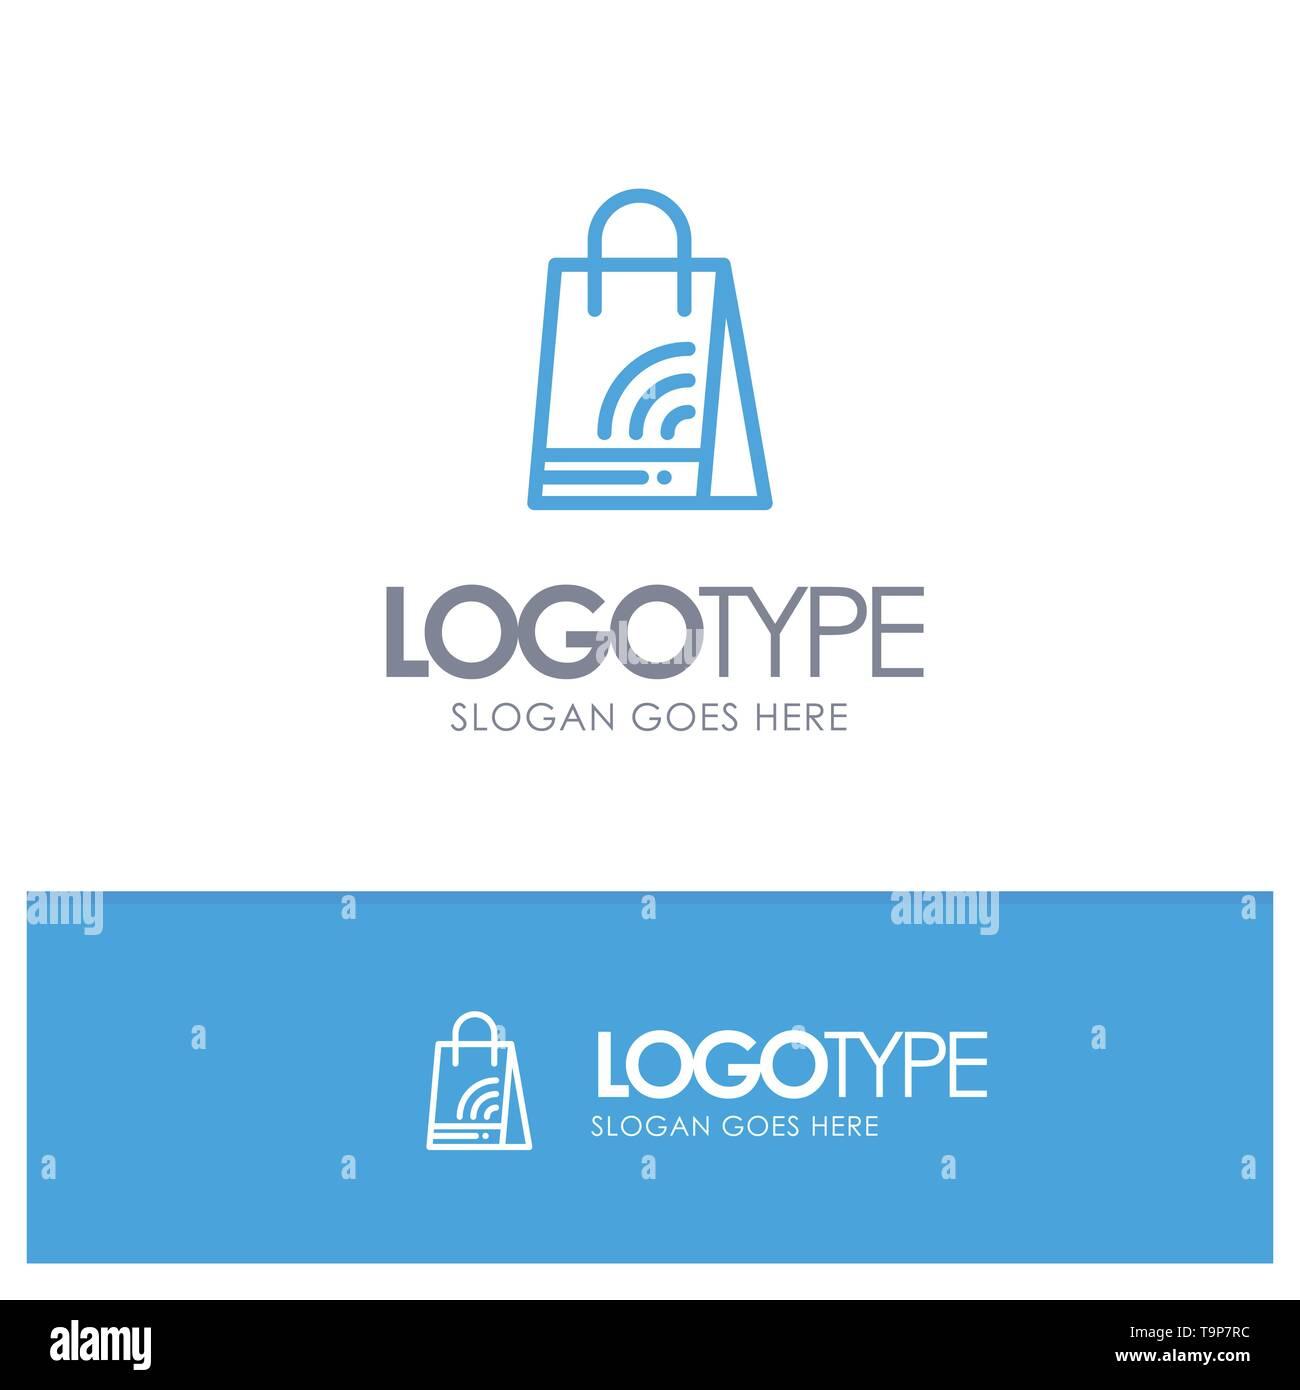 Bag, Handbag, Wifi, Shopping Blue outLine Logo with place for tagline - Stock Image